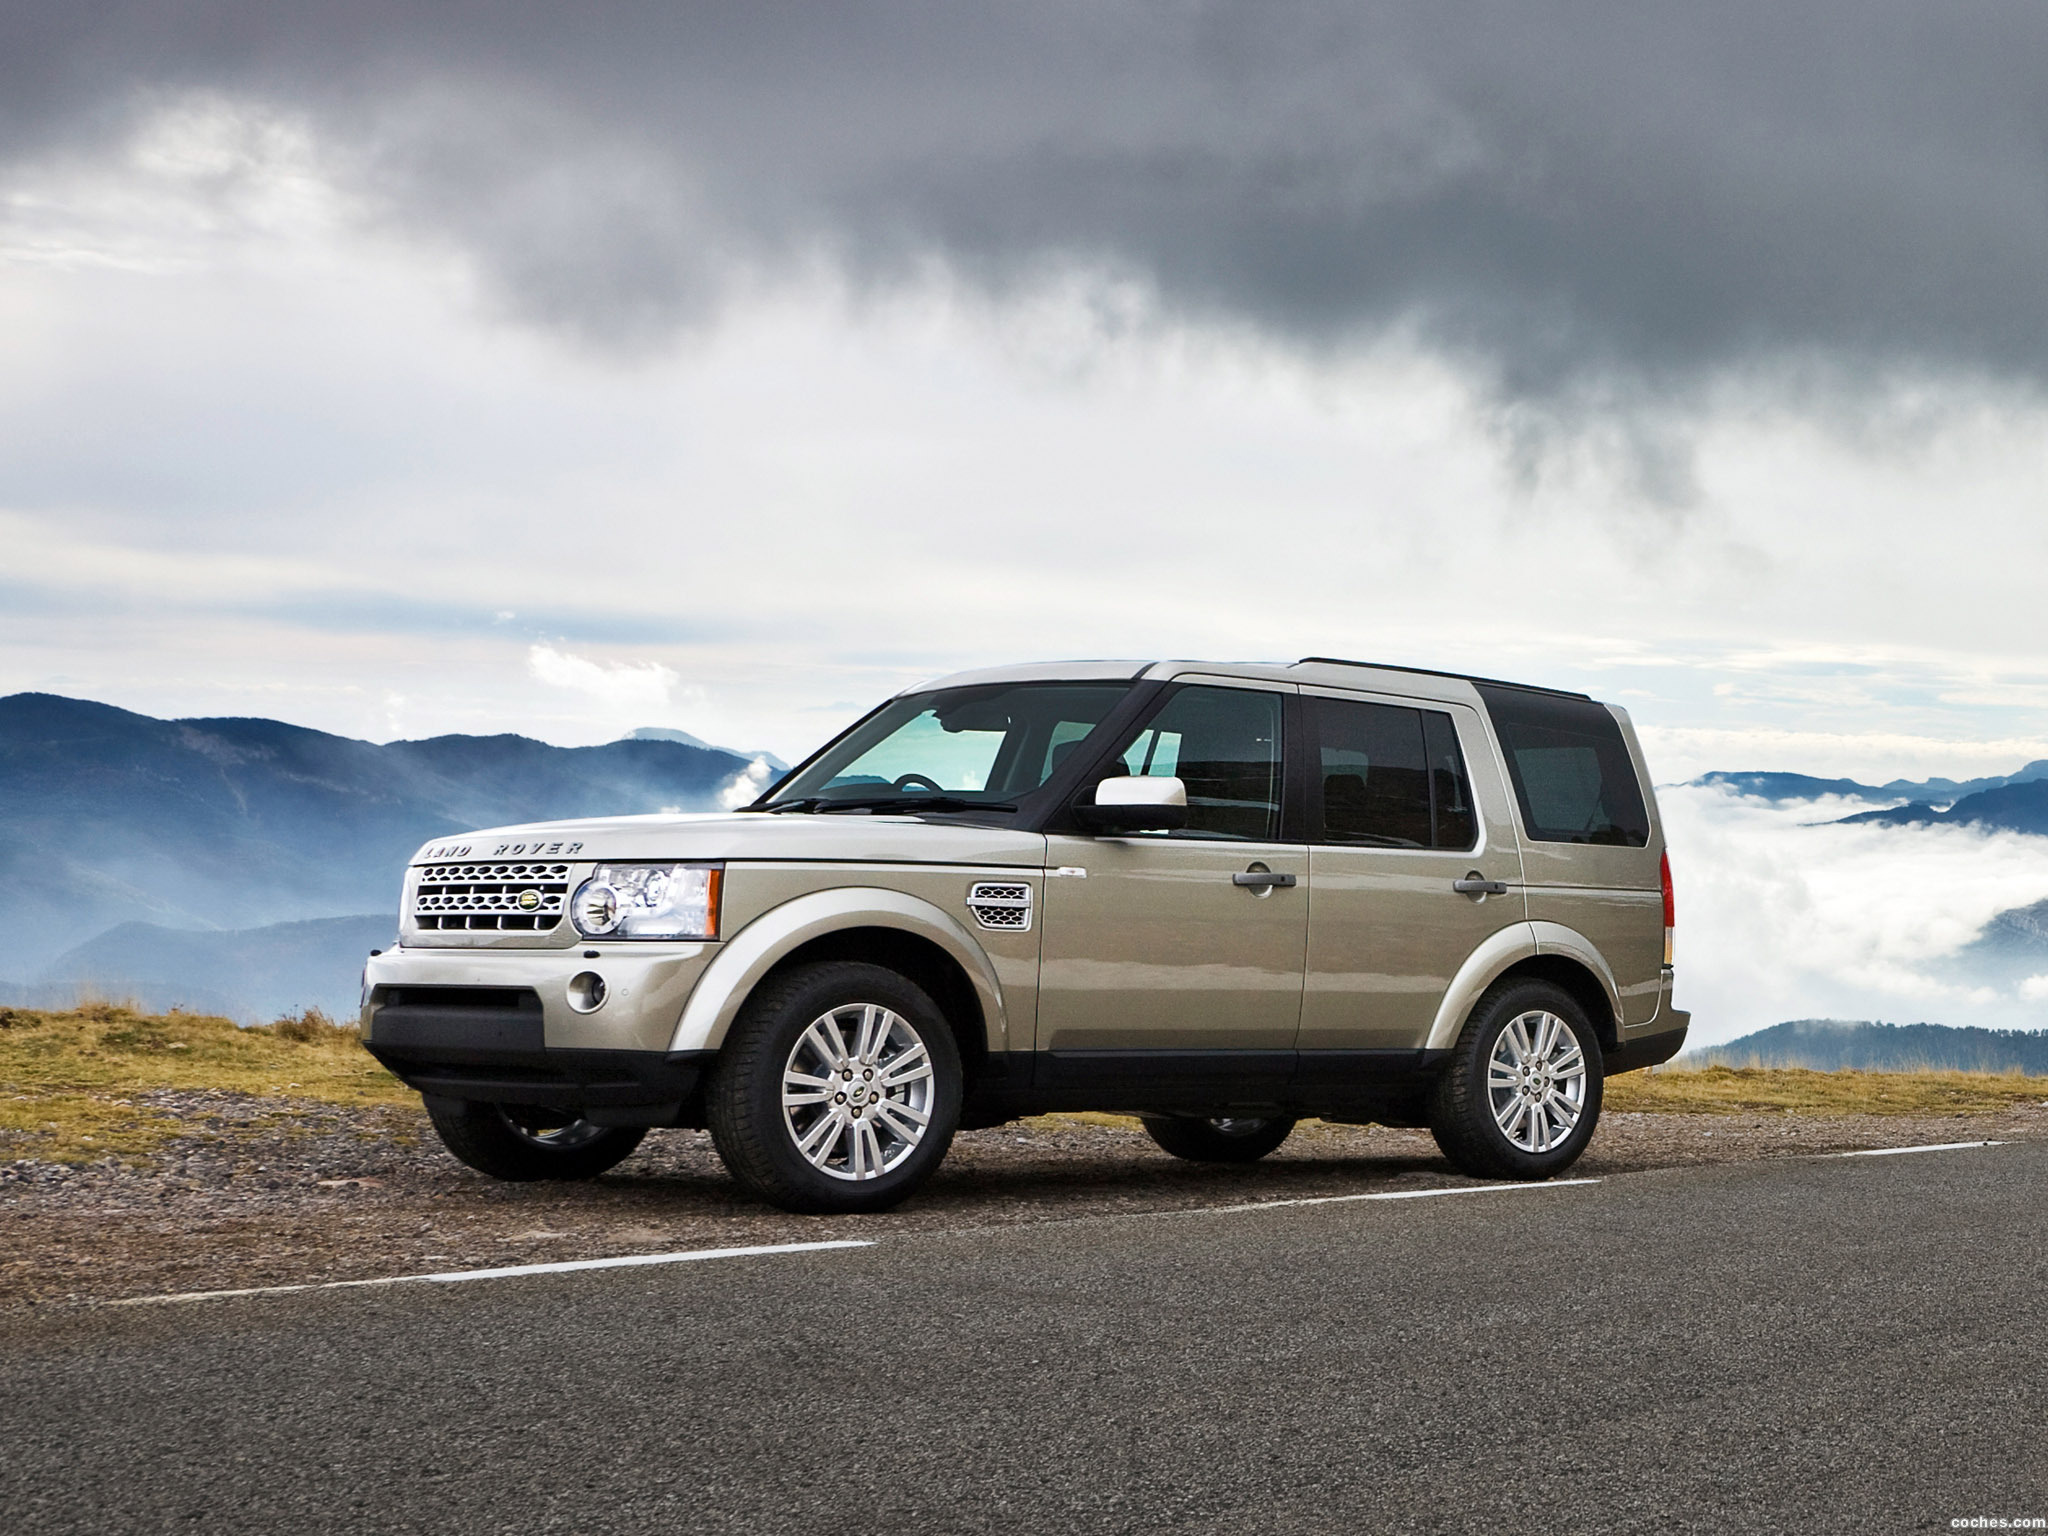 Foto 3 de Land Rover Discovery 4 3.0 TDV6 2009